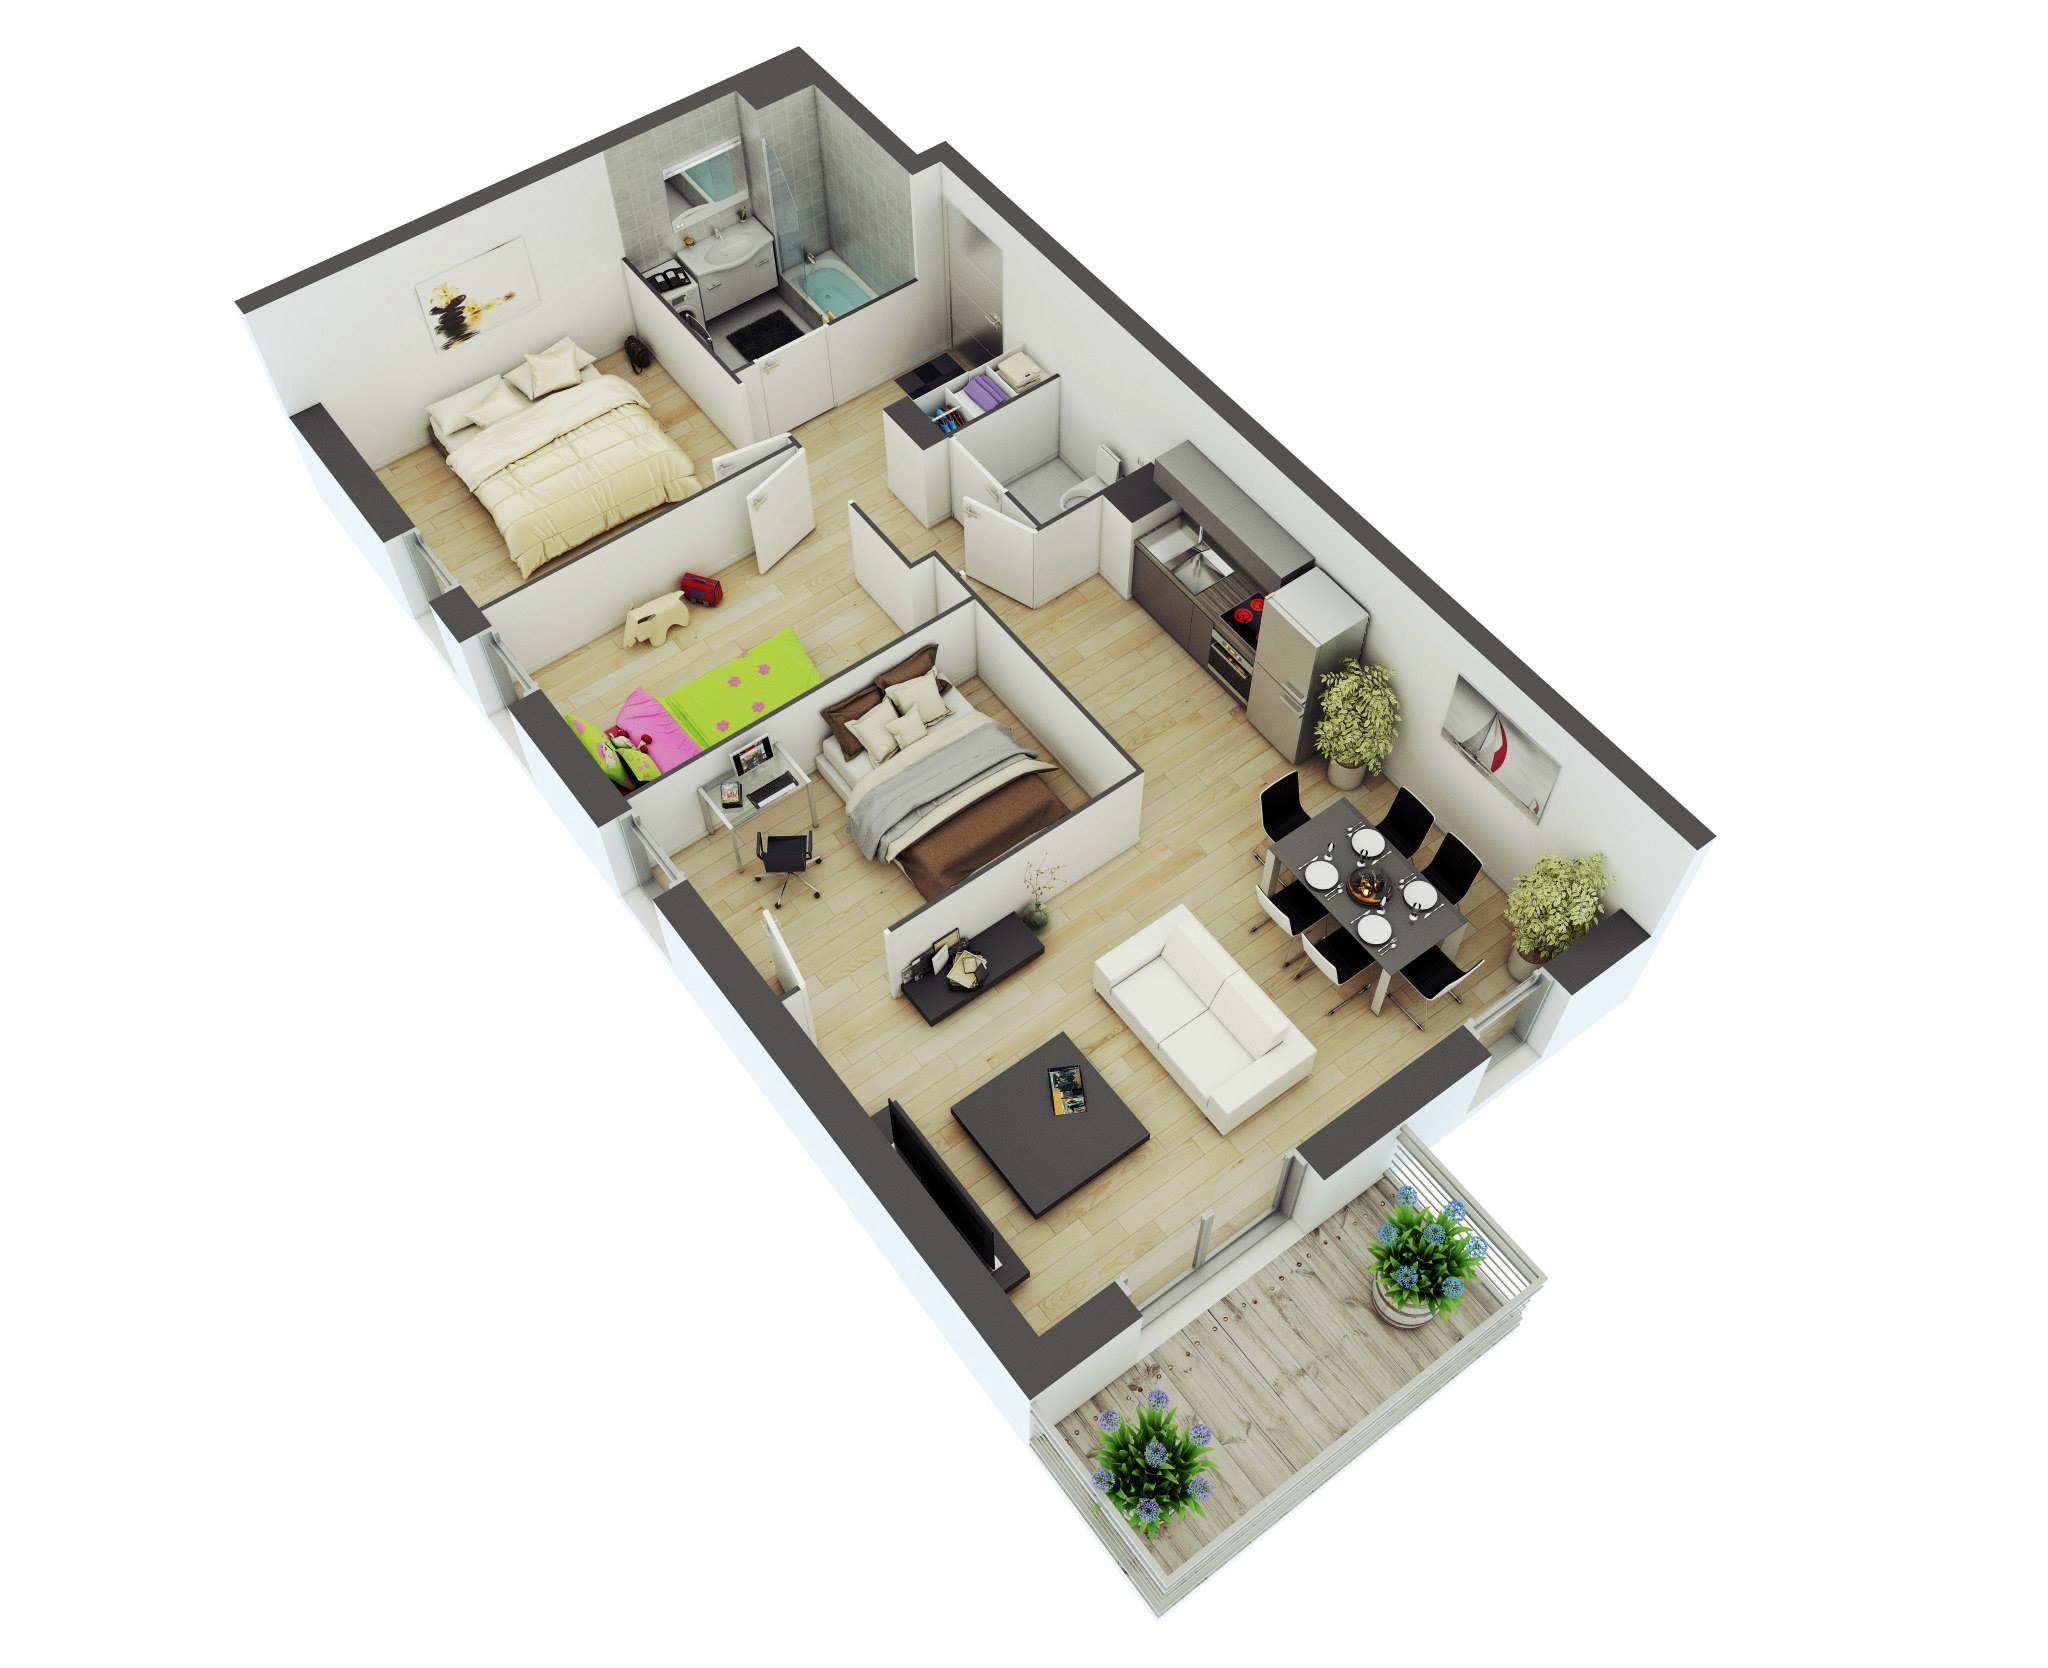 Three bedrooms png 2048x1668